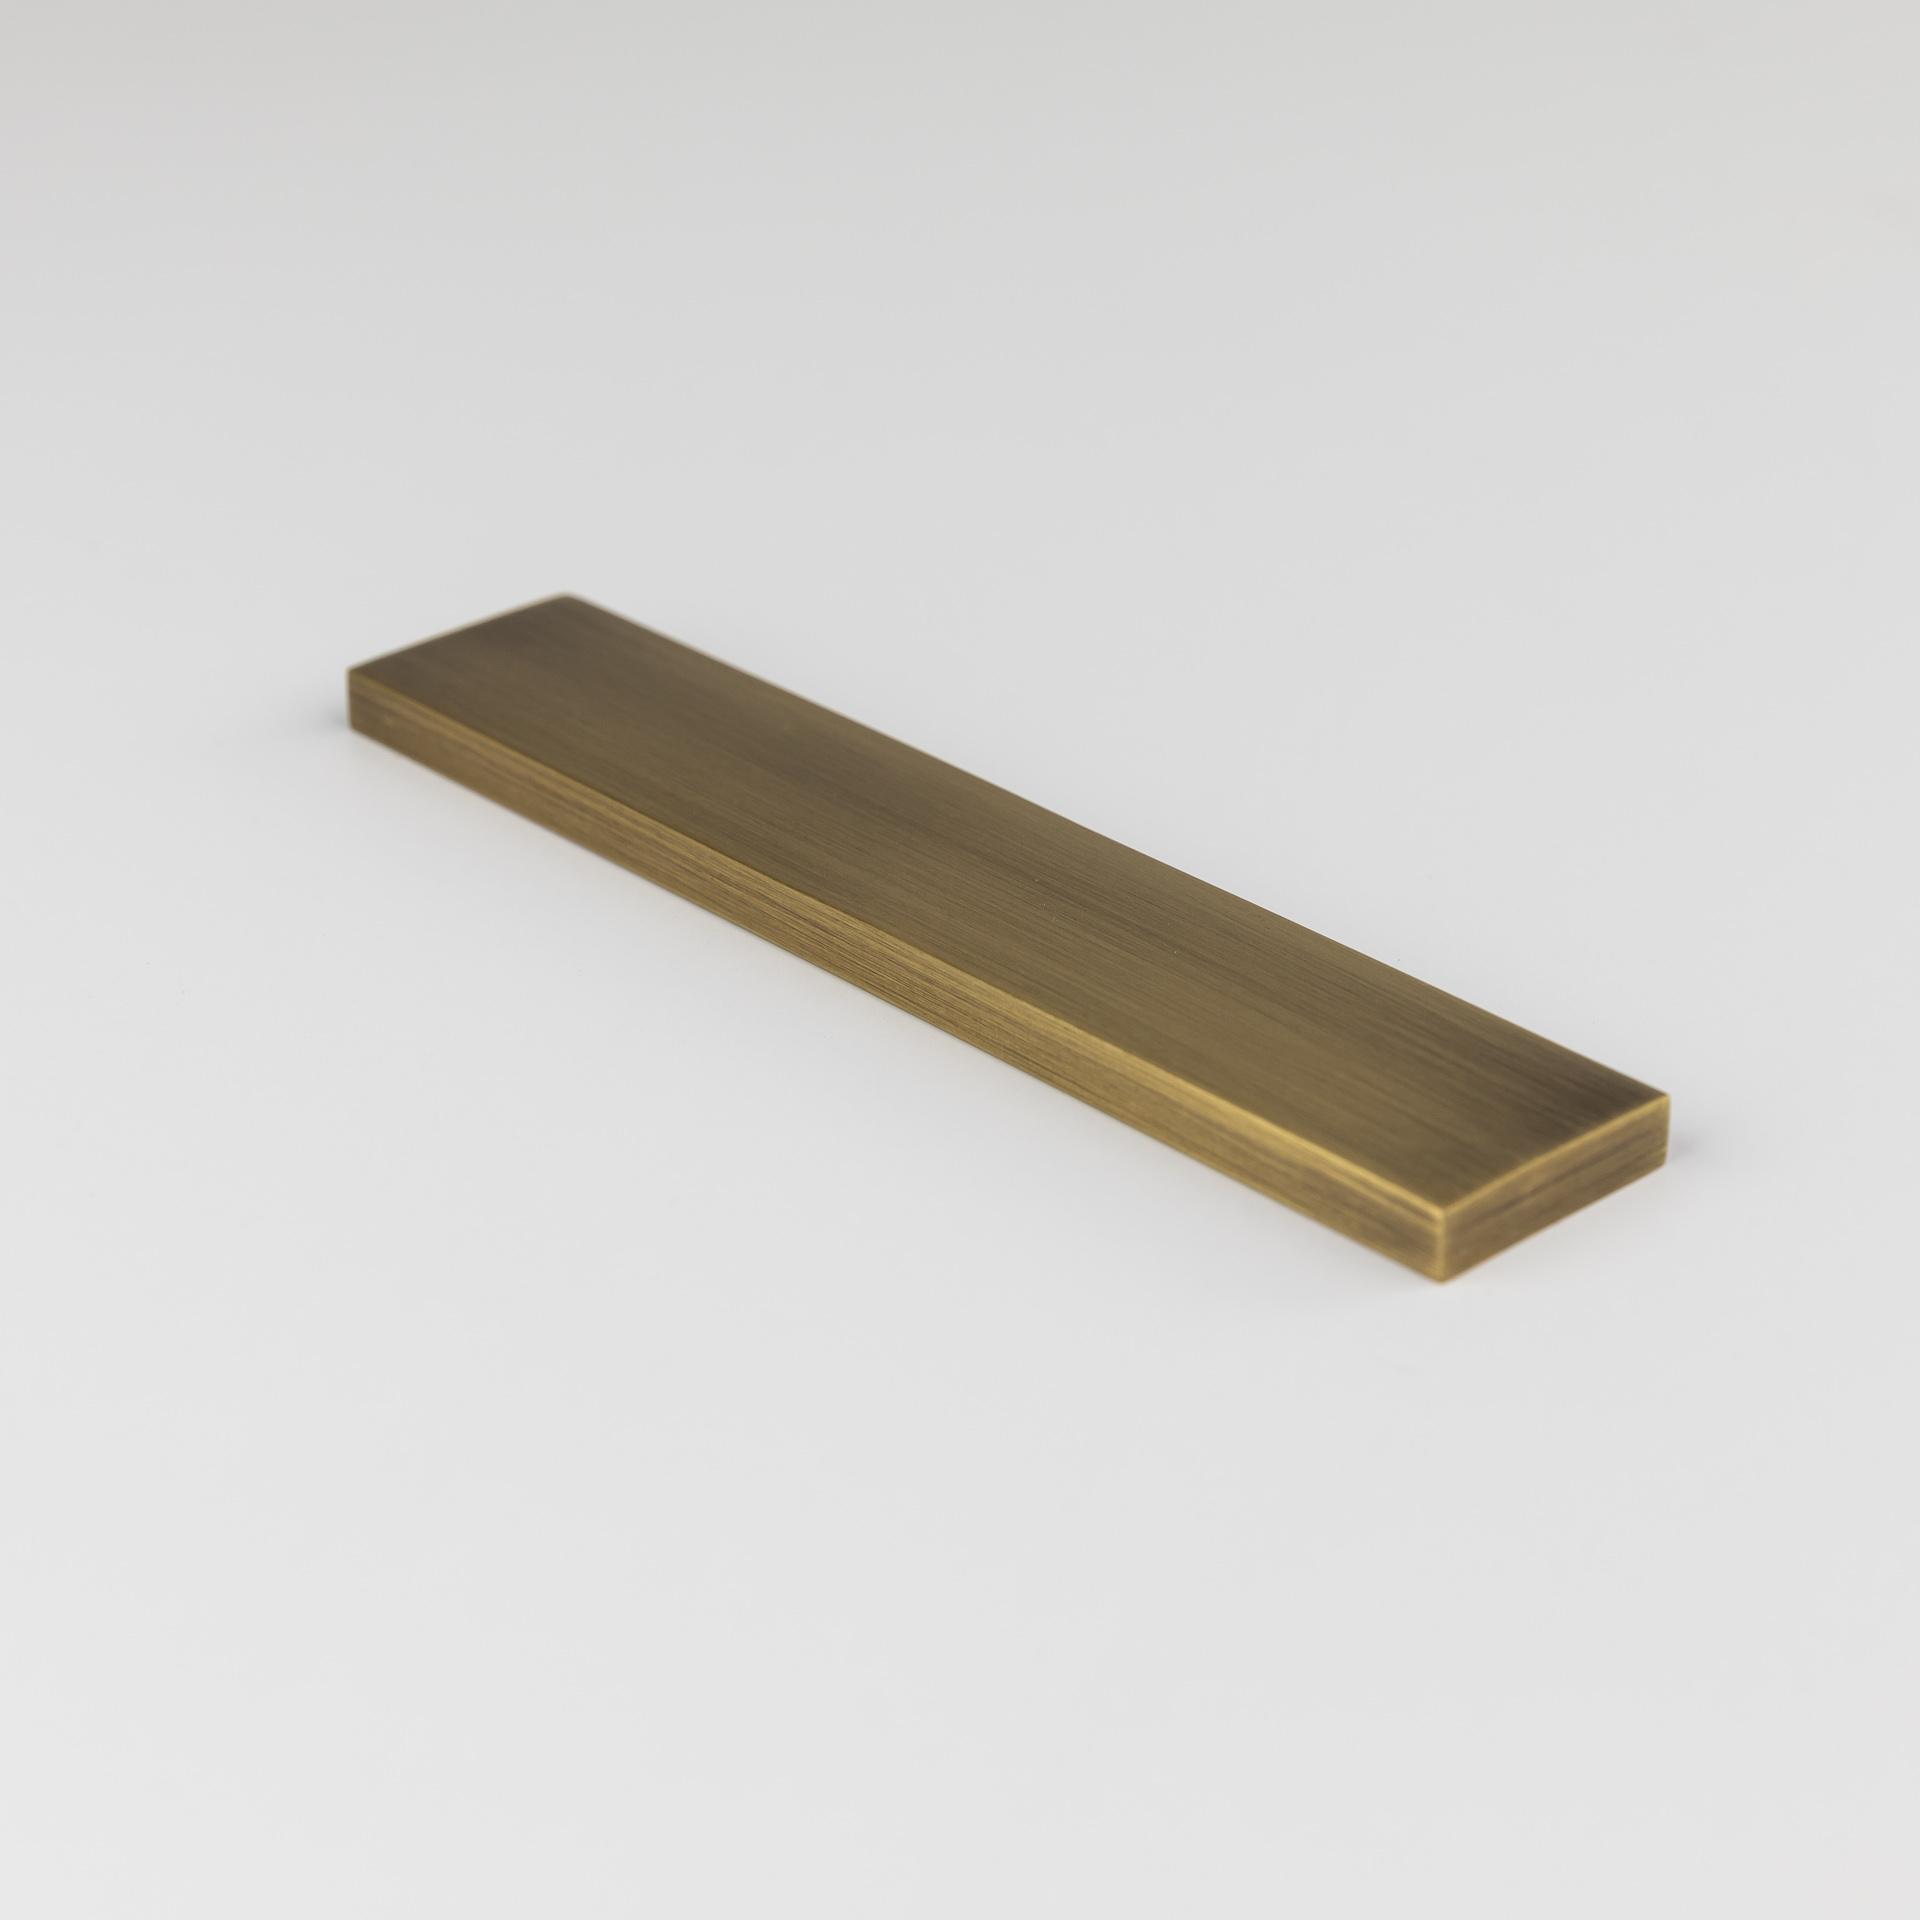 Light Antiqued Brass